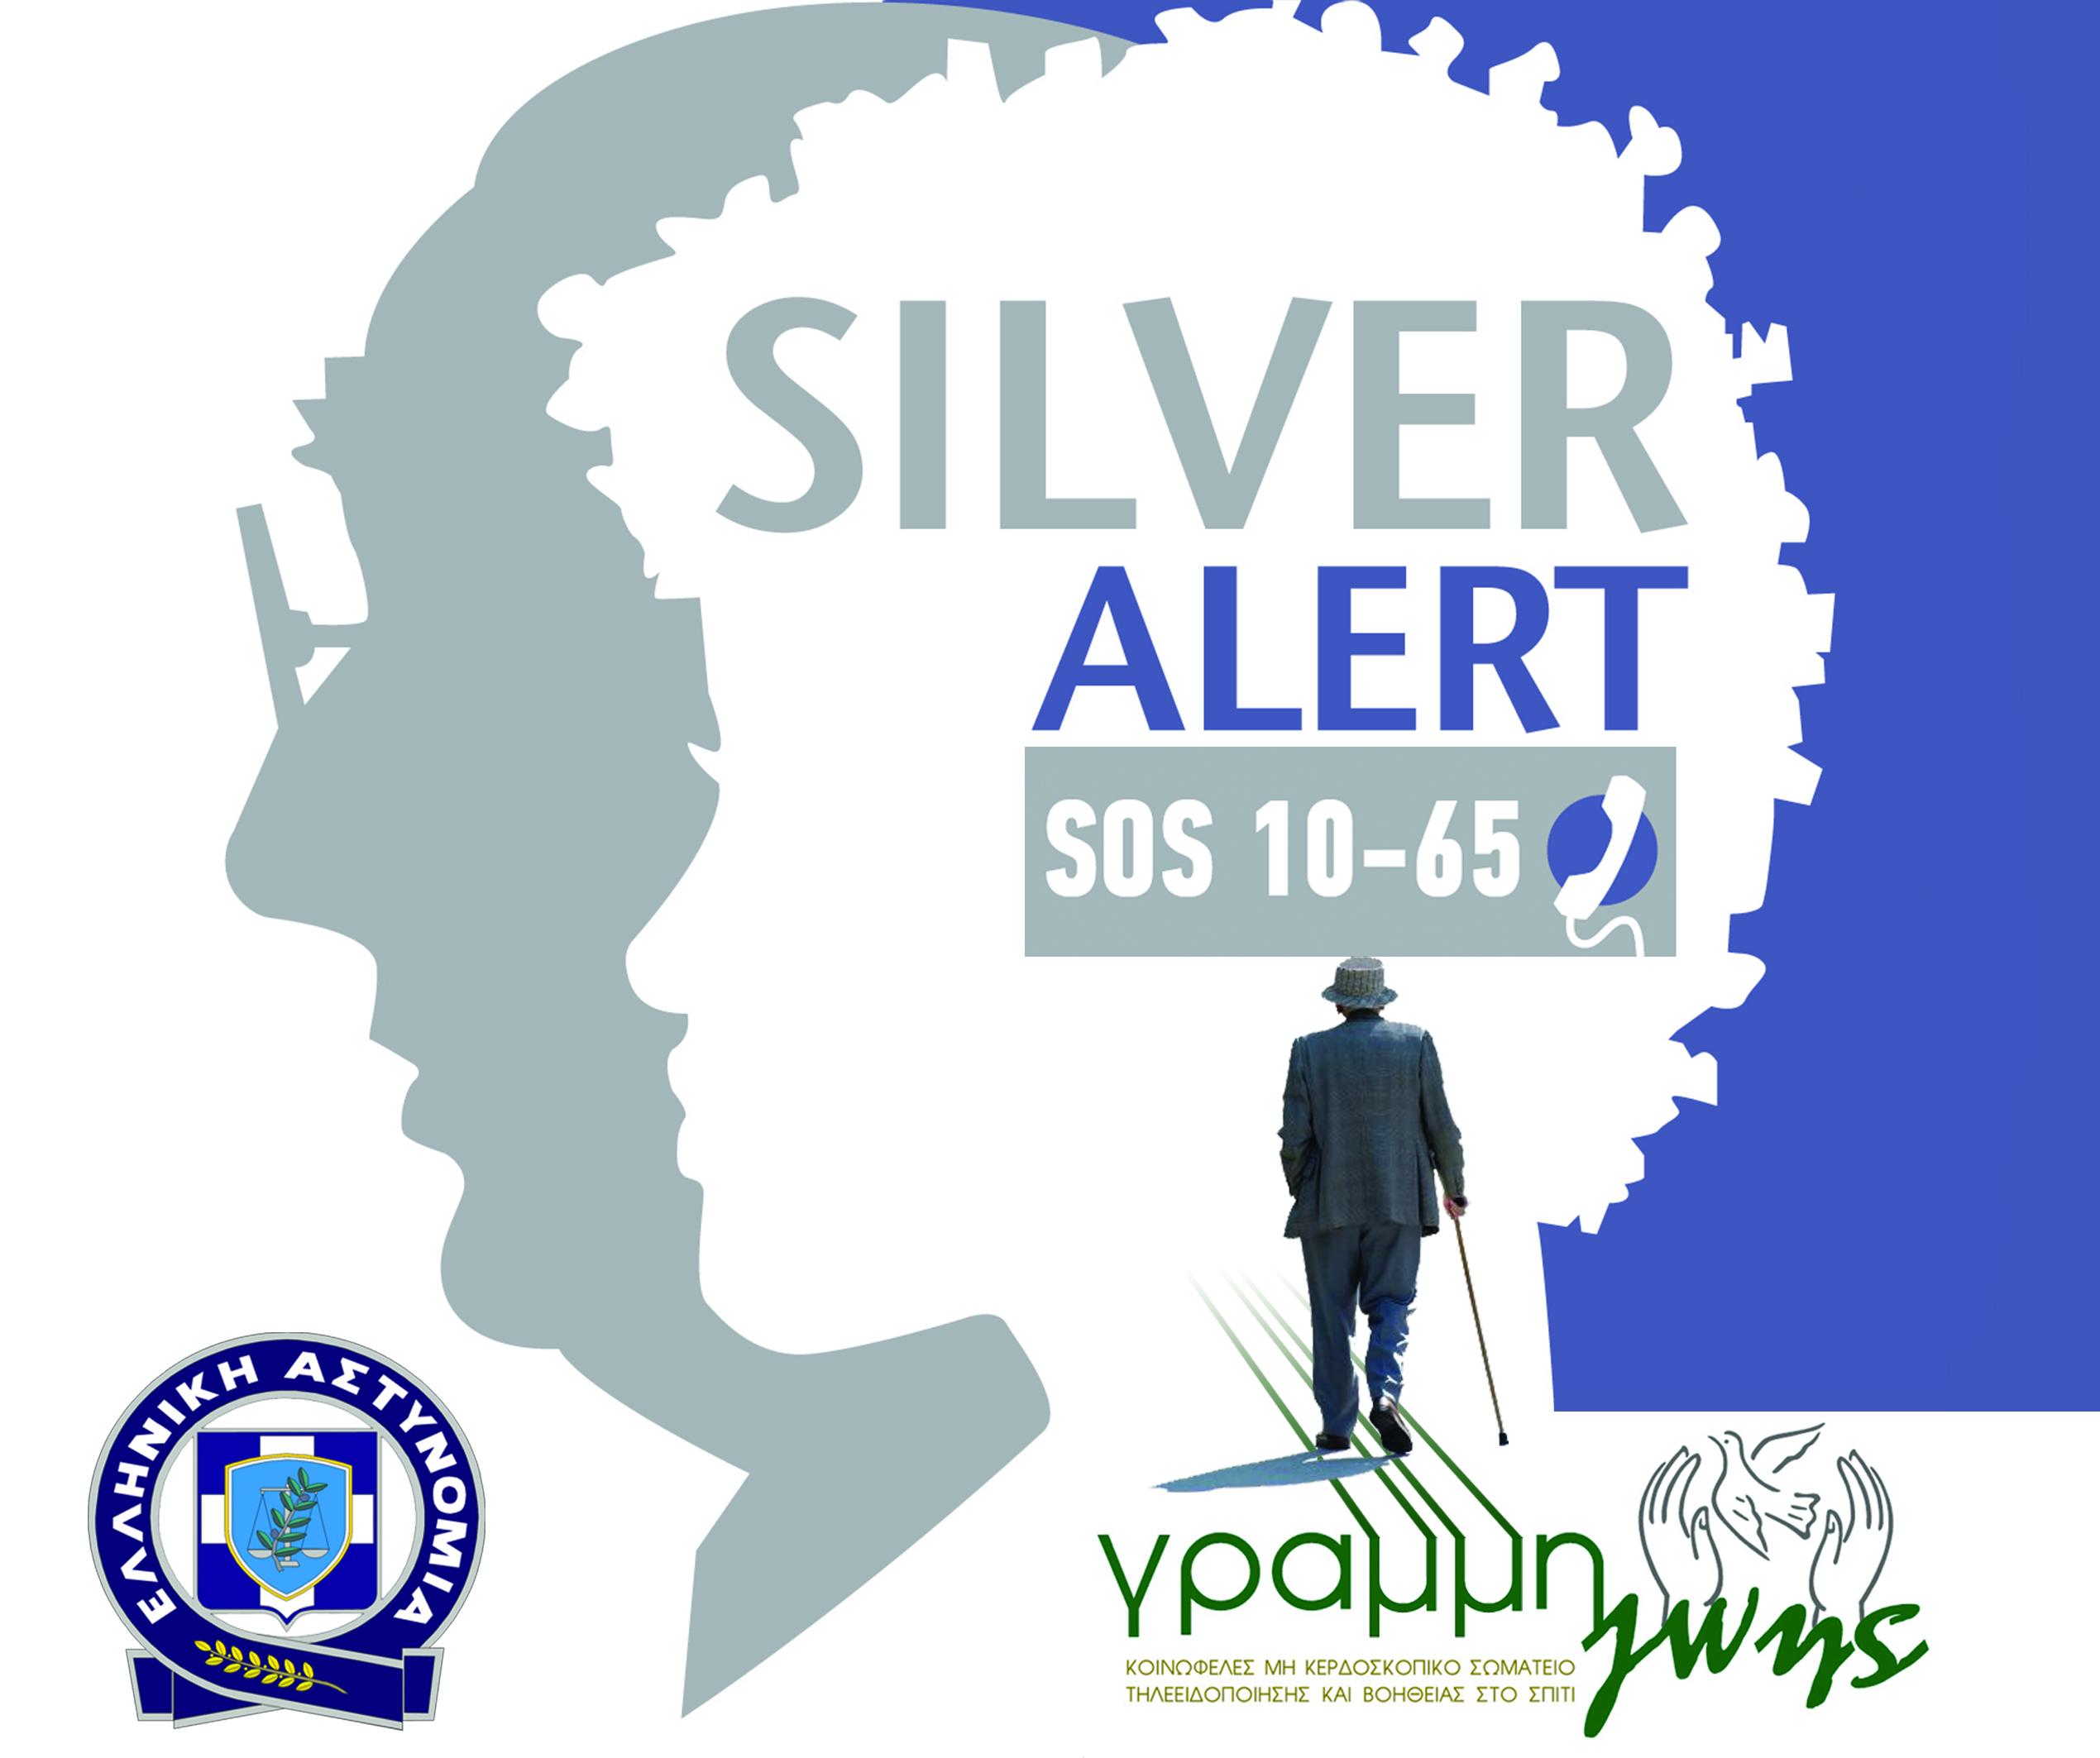 Silver alert: Νεκρή 90χρονη στην Κερίου της Ζάκυνθου